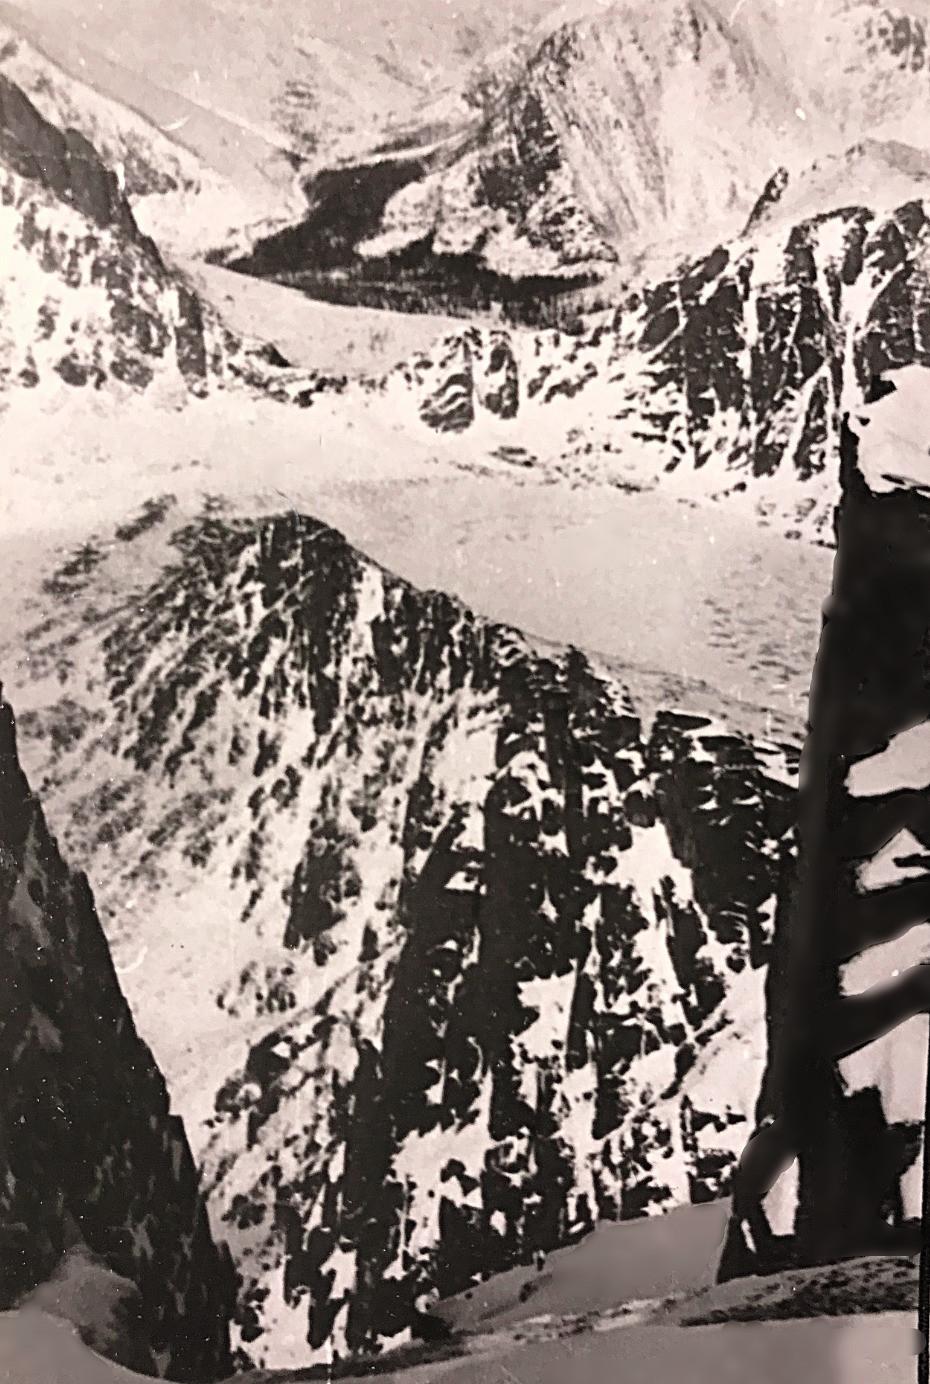 Озеро Медвежье, за ним виден перевал в реку Курайгагна